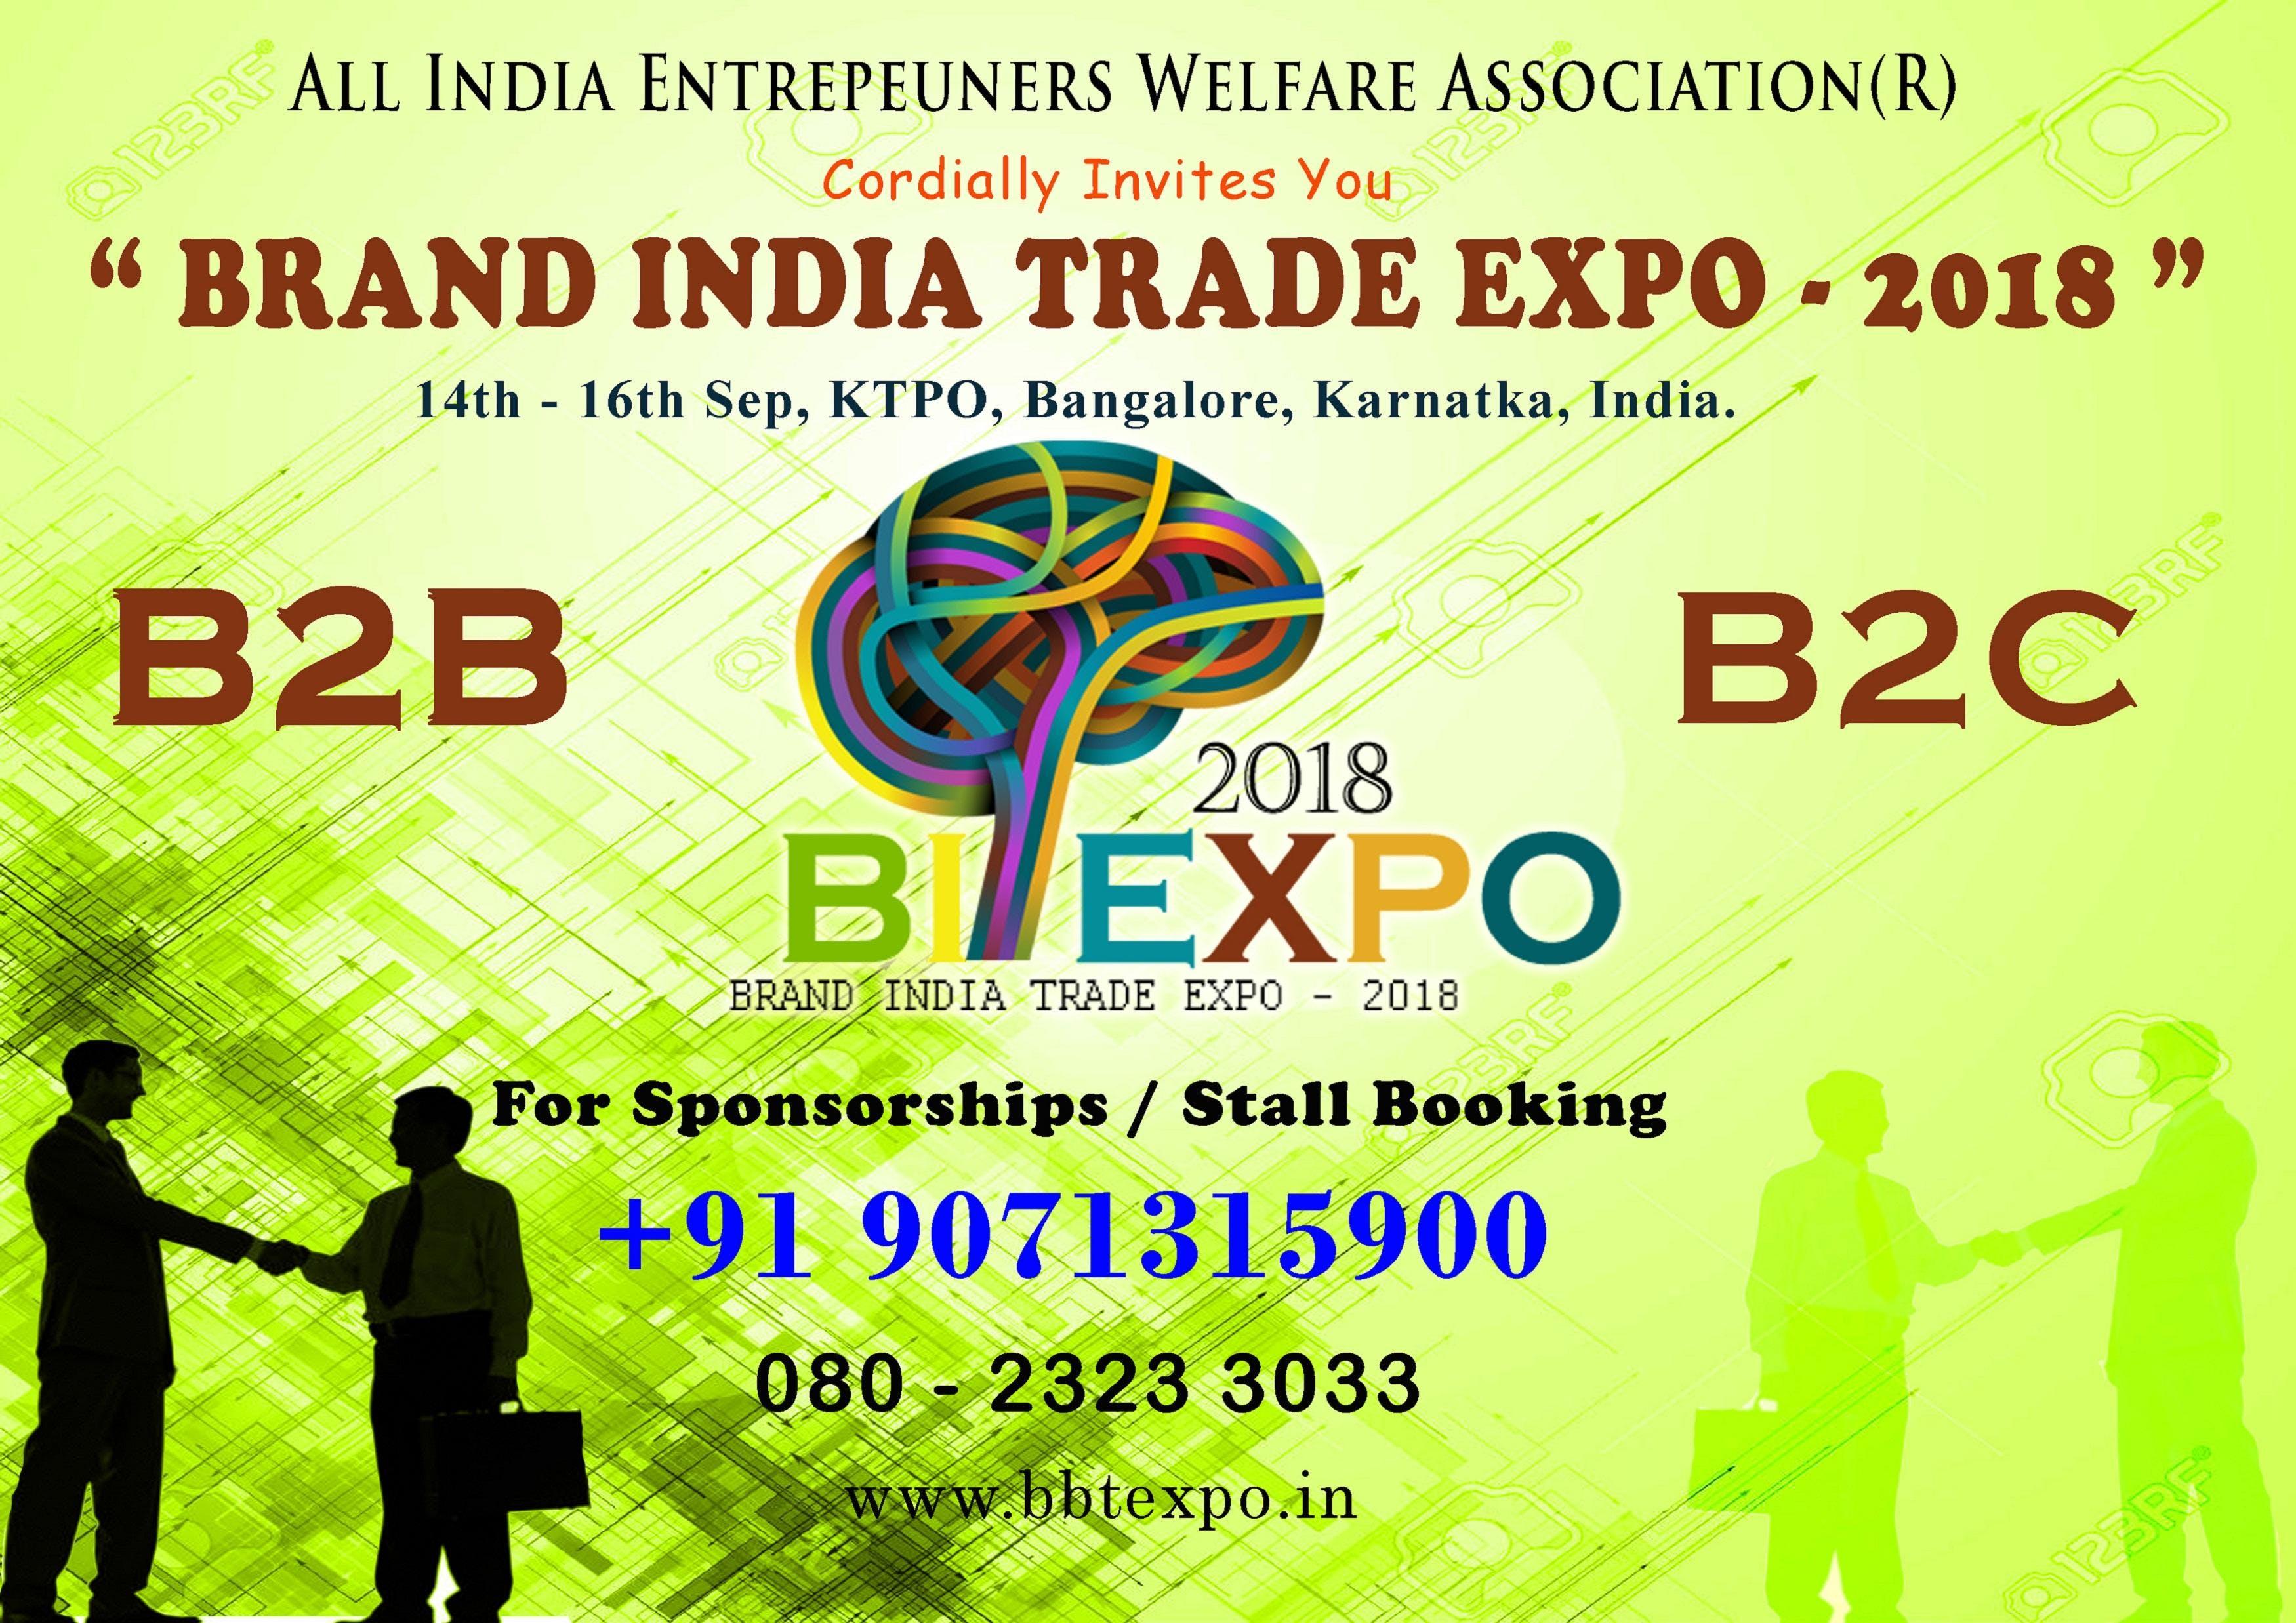 Brand India Trade Expo